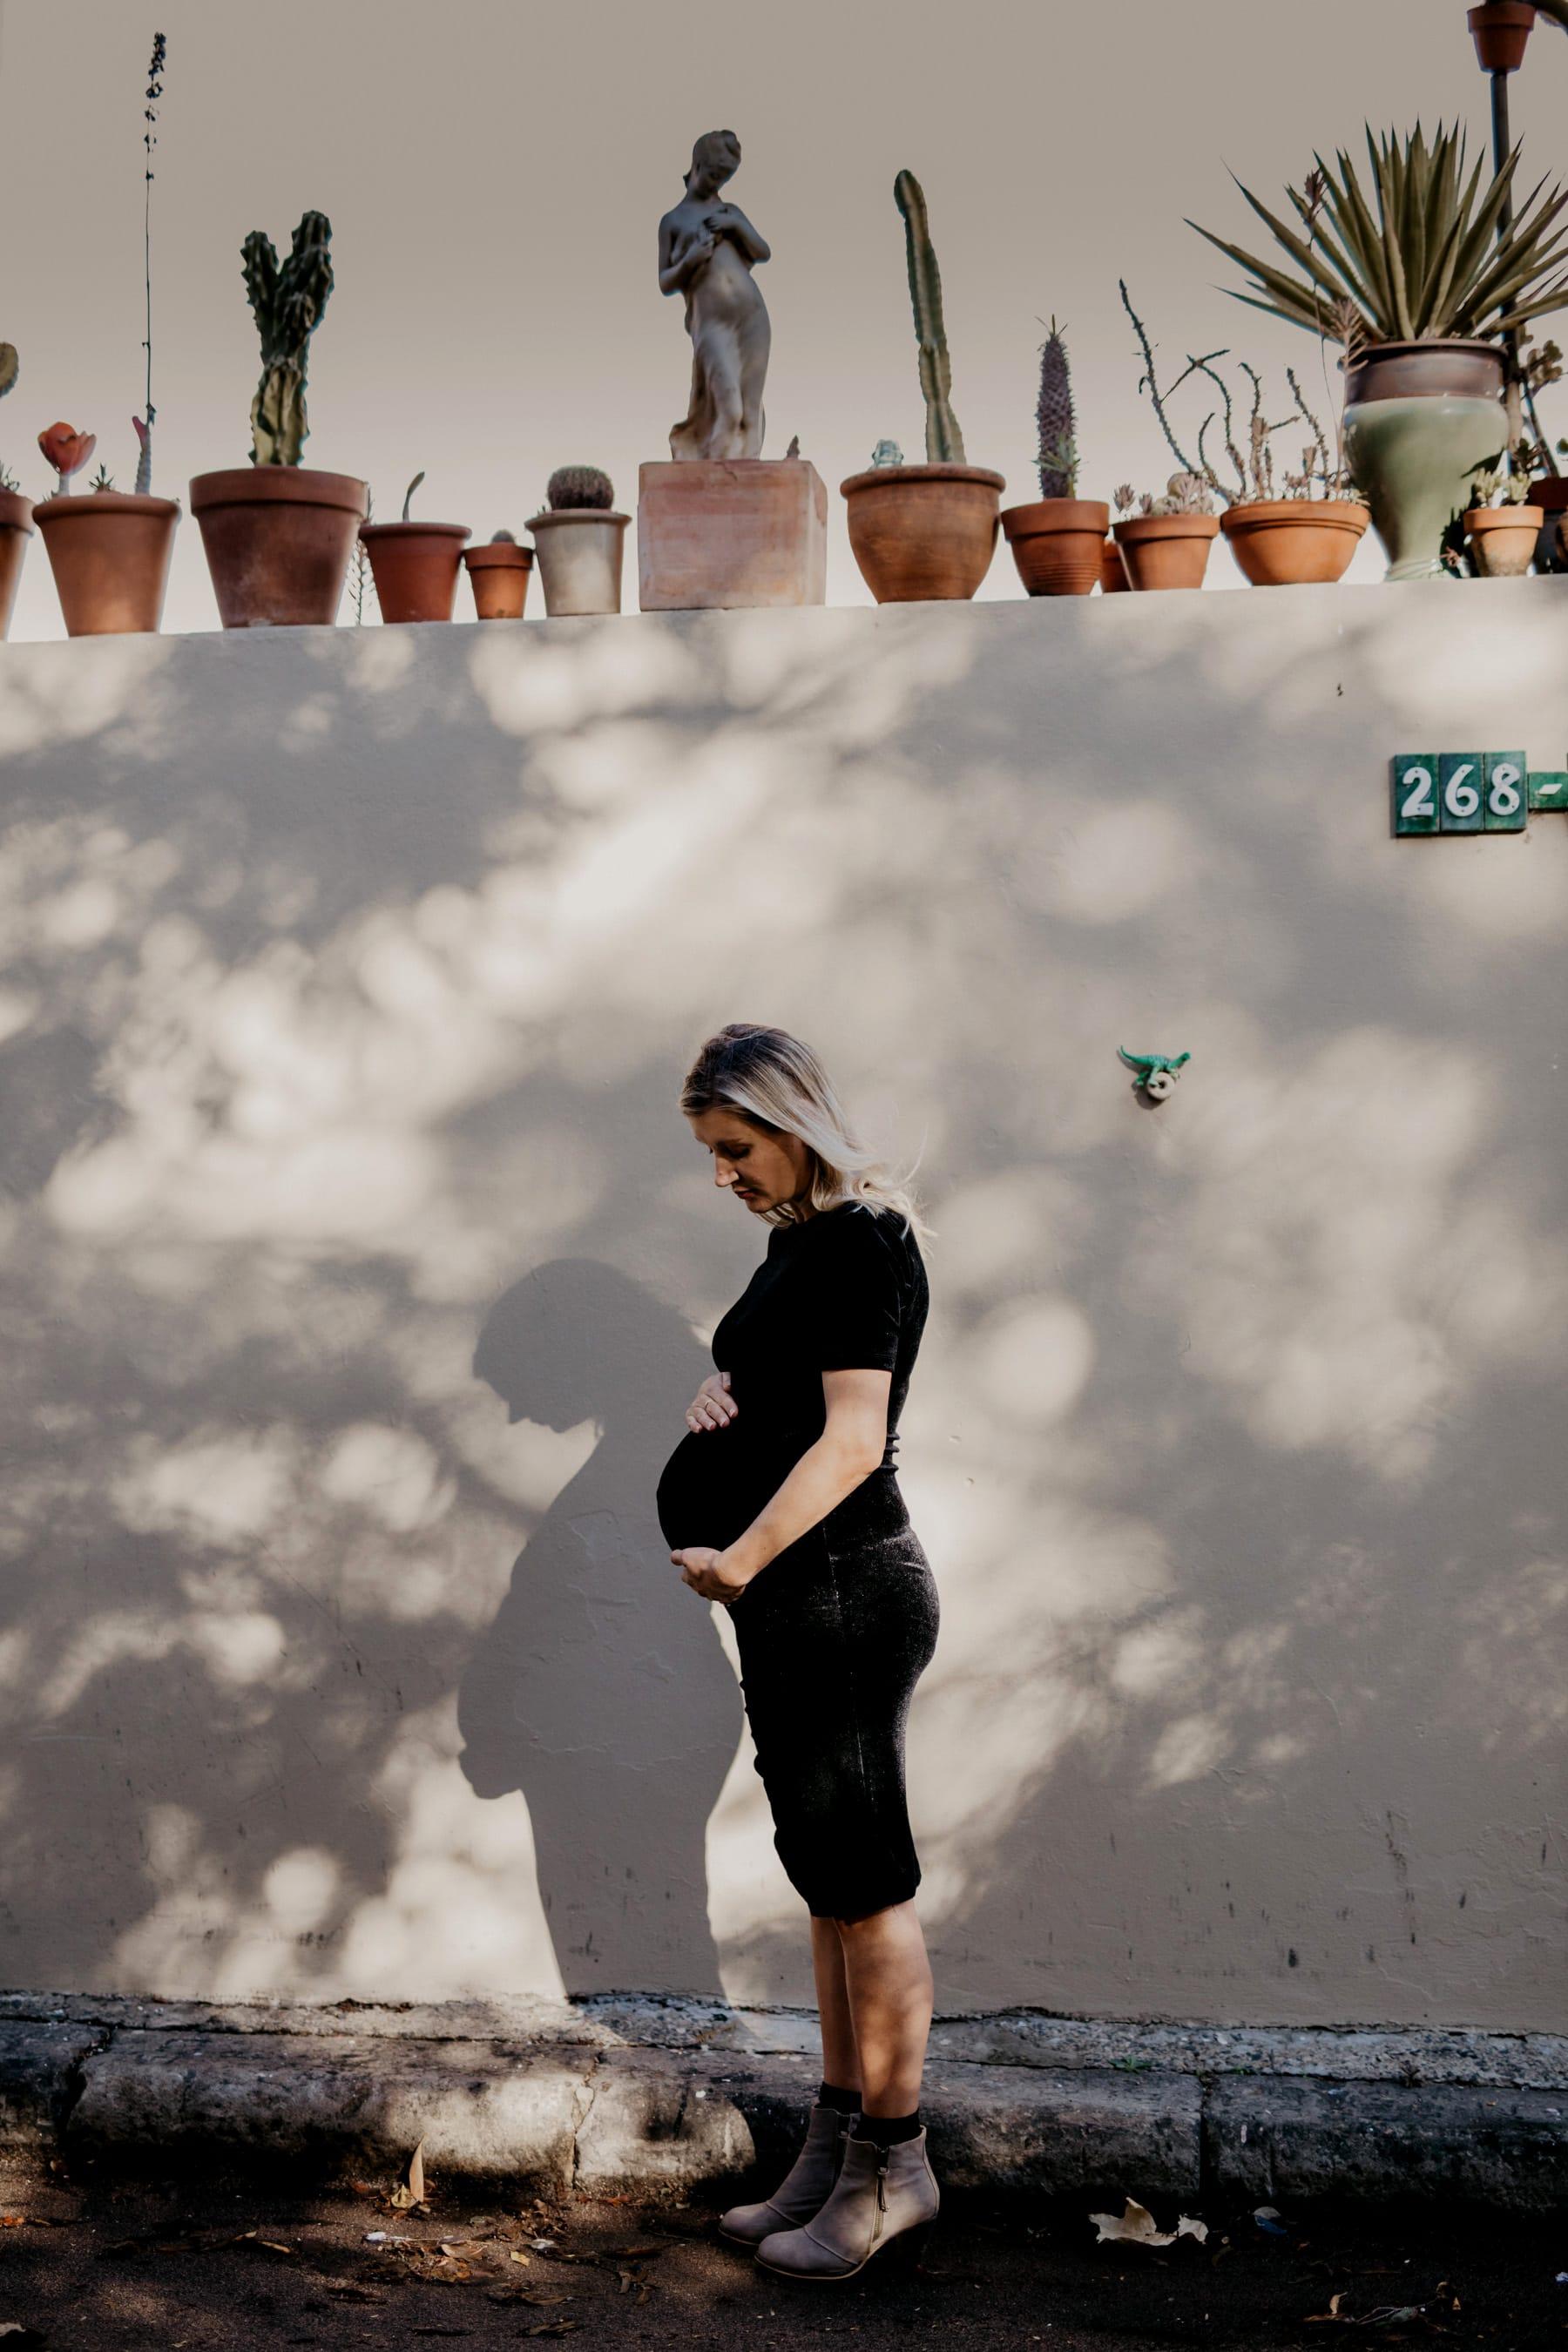 maternity-maternityphotography-lovers-sutherlandshirematernityphotographyer-sydneymaternityphotographer-babybump0009